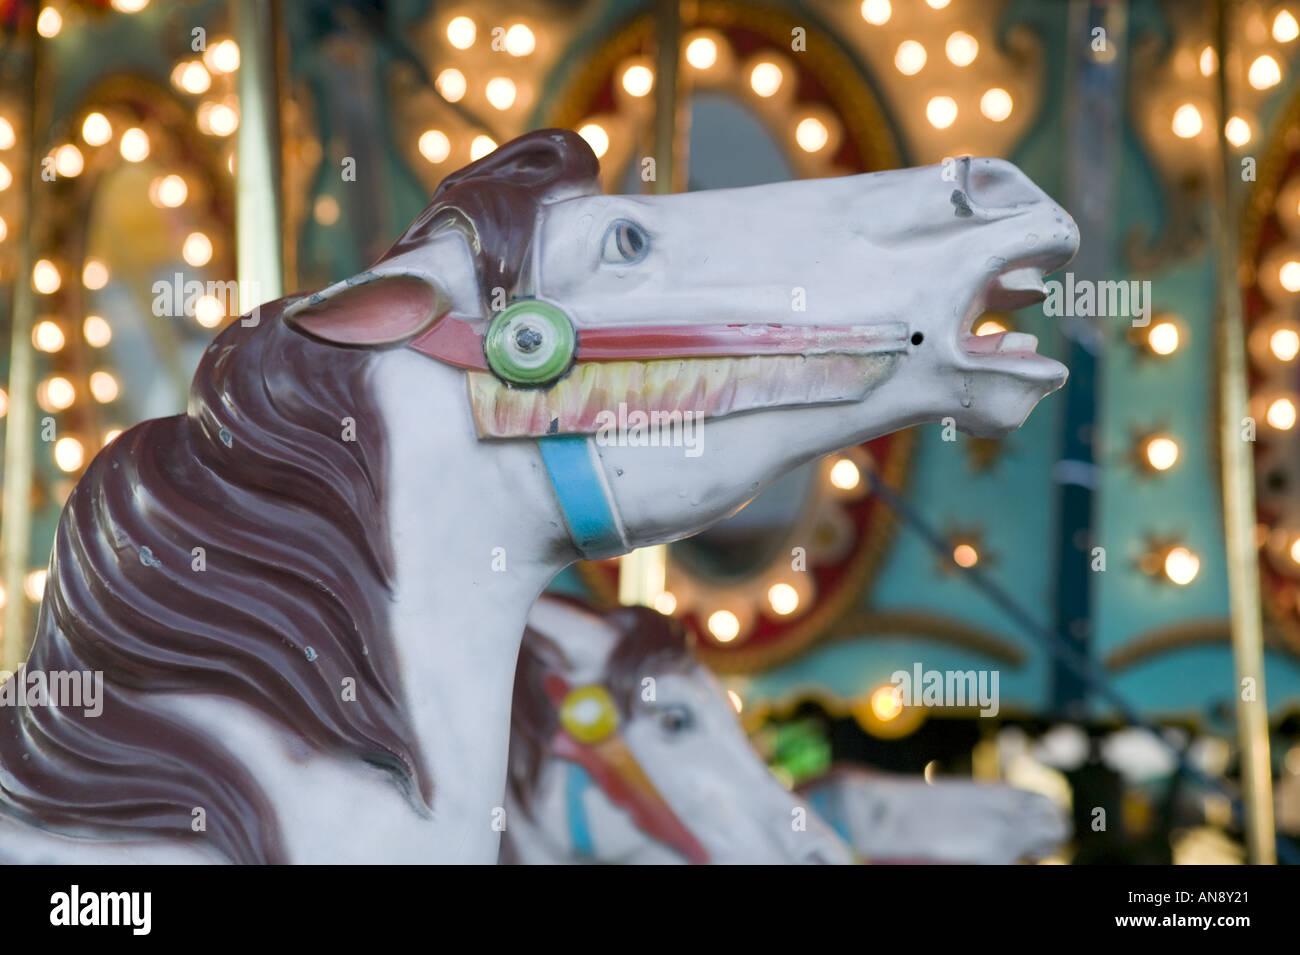 New york montgomery county fonda - Horse Head On Merry Go Round Fonda Fair Montgomery County New York